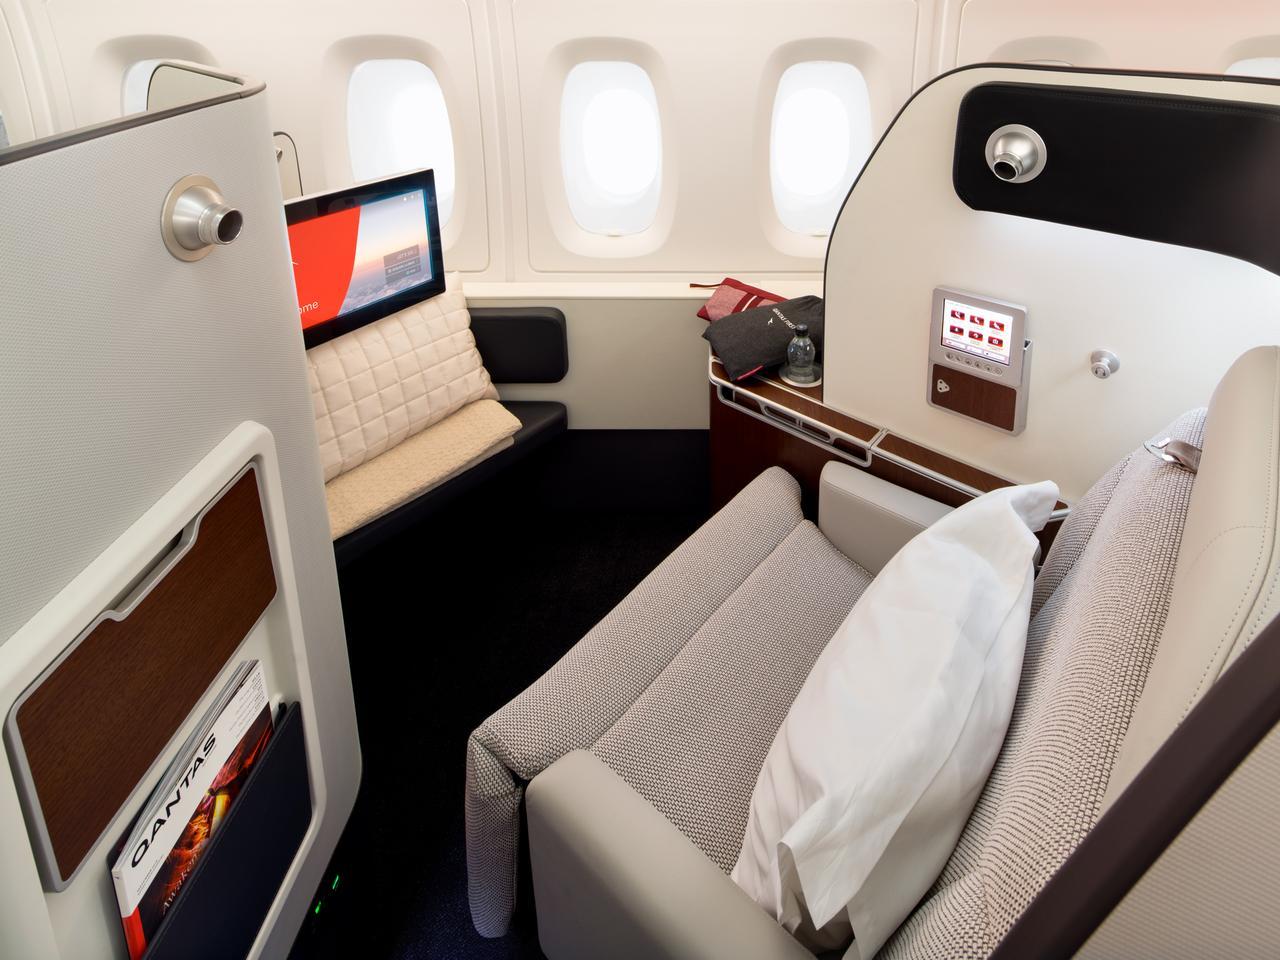 QANTAS' UPGRADED A380s Picture: Qantas